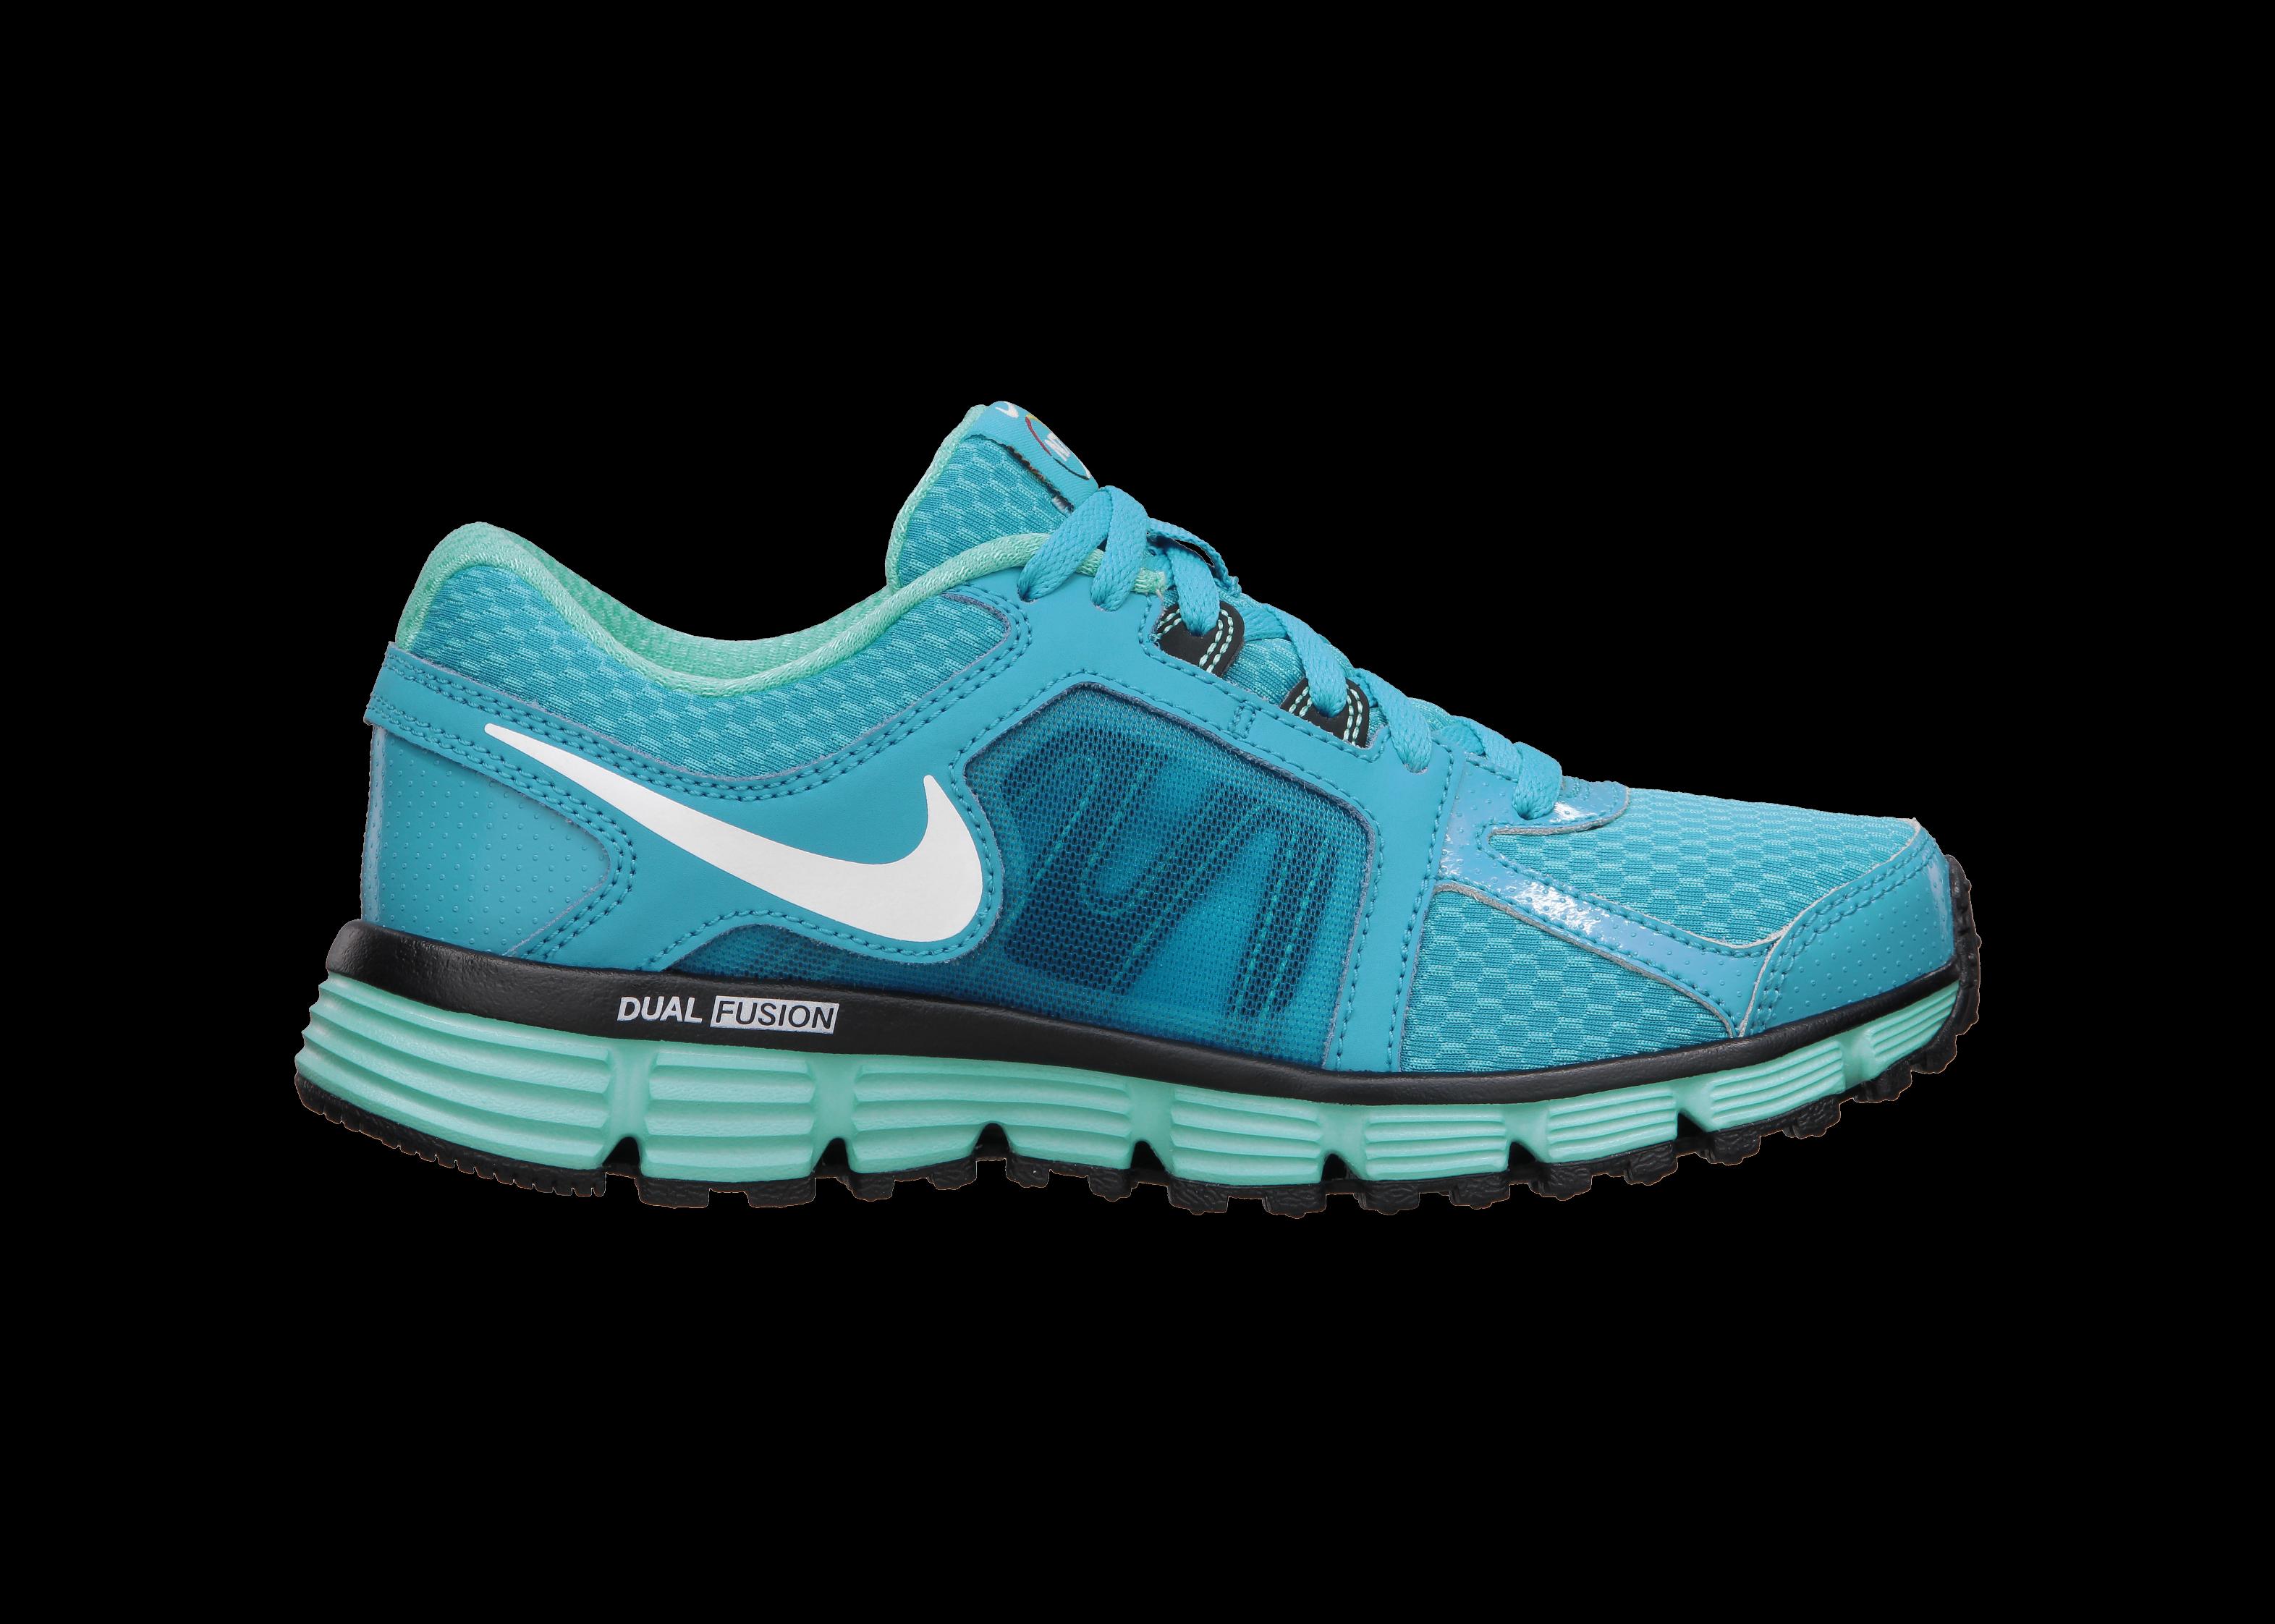 ... Nike N7 Dual Fusion ST 2 (3.5y-7y) Girls' Running Shoe has a running